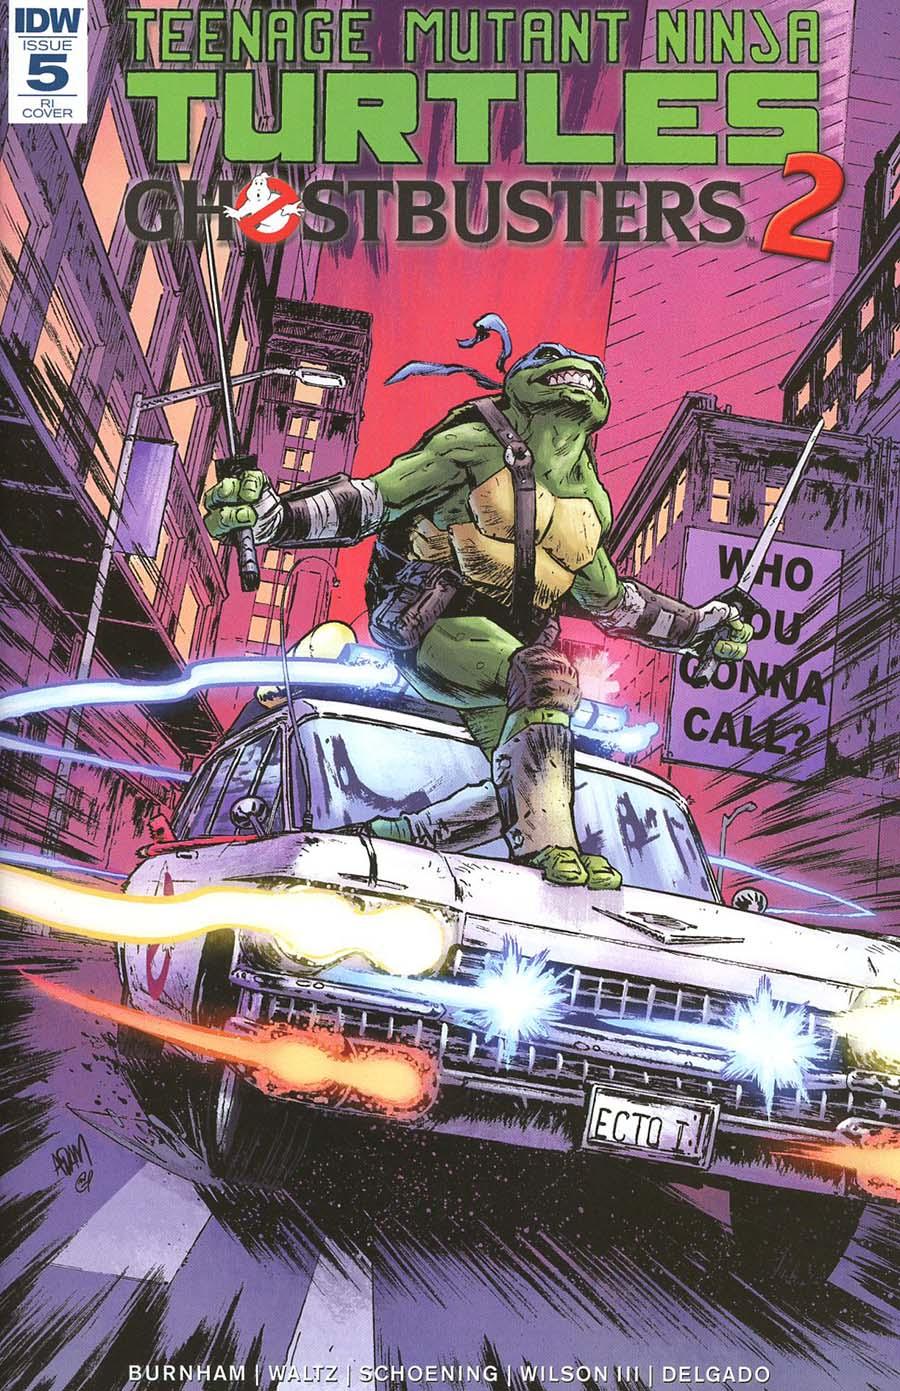 Teenage Mutant Ninja Turtles Ghostbusters II #5 Cover C Incentive Adam Gorham Variant Cover